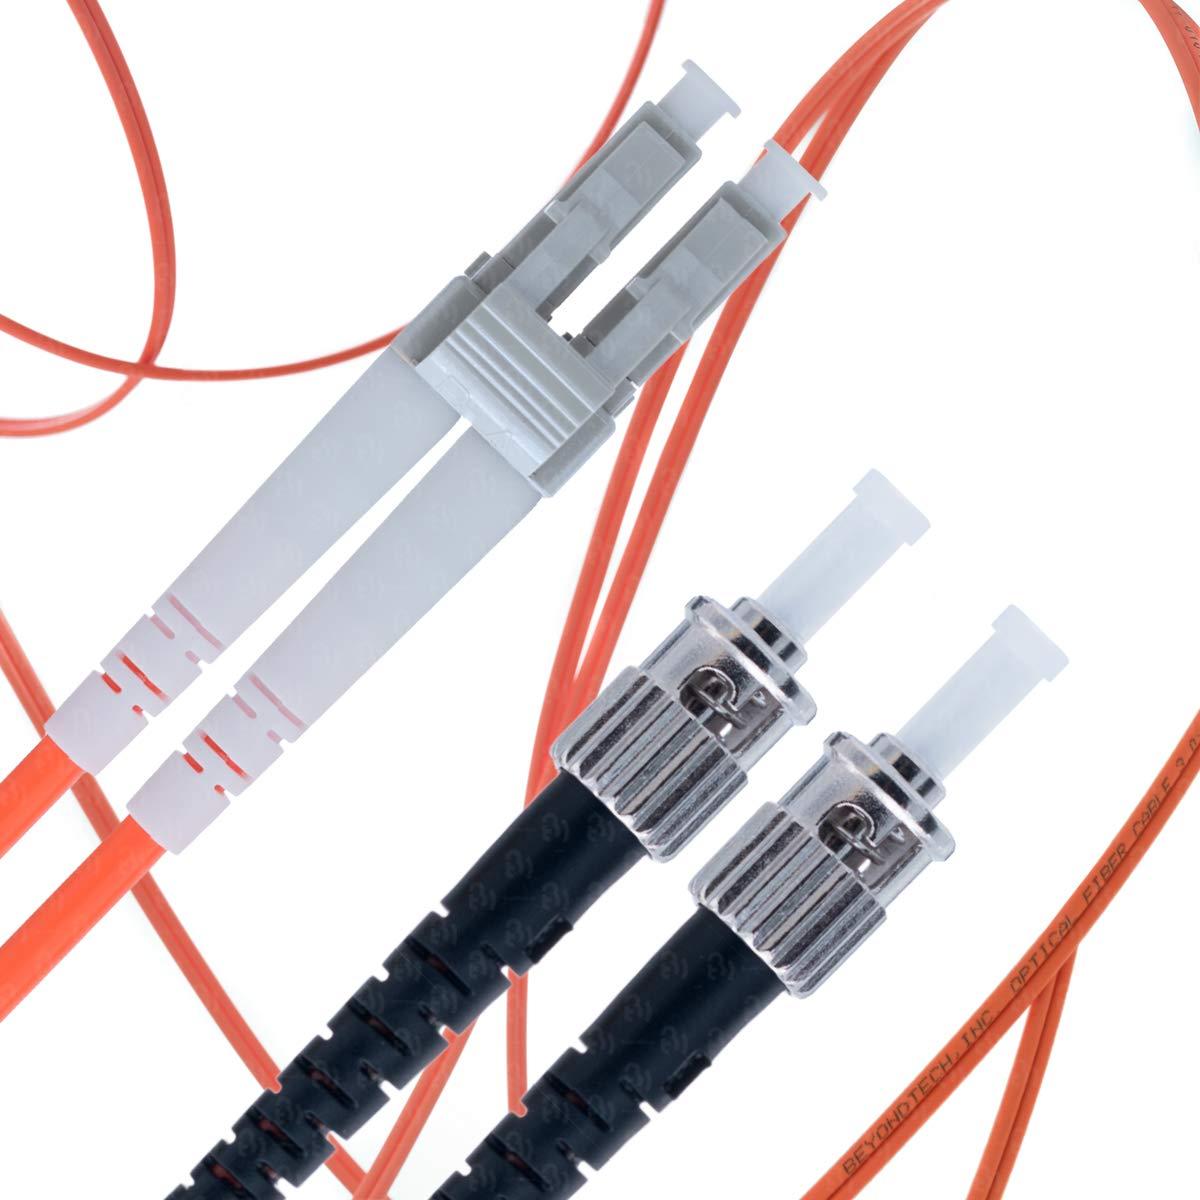 LC to ST Fiber Patch Cable Multimode Duplex - 25m (82ft) - 62.5/125 OM1 - Beyondtech PureOptics Series